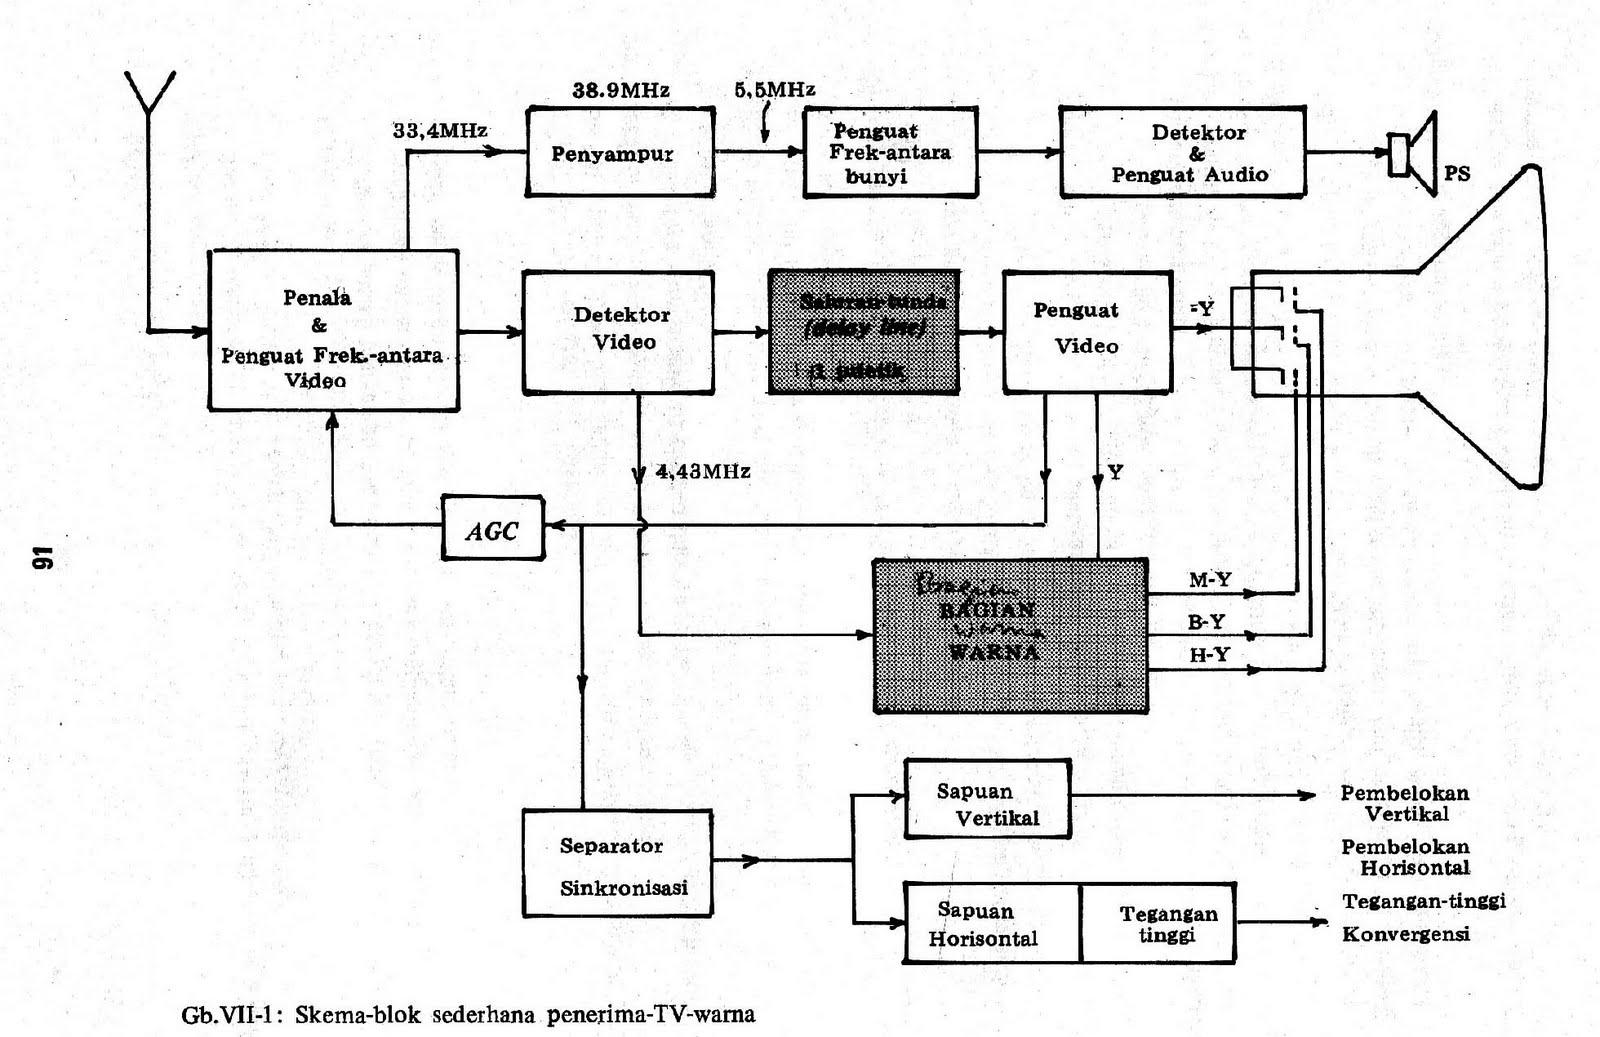 Block diagram black and white tv wiring diagram my wonderland schematic bloc diagram of black and white tv rh aerothropicbutterfly blogspot com block diagram of black and white television receiver smart ccuart Images